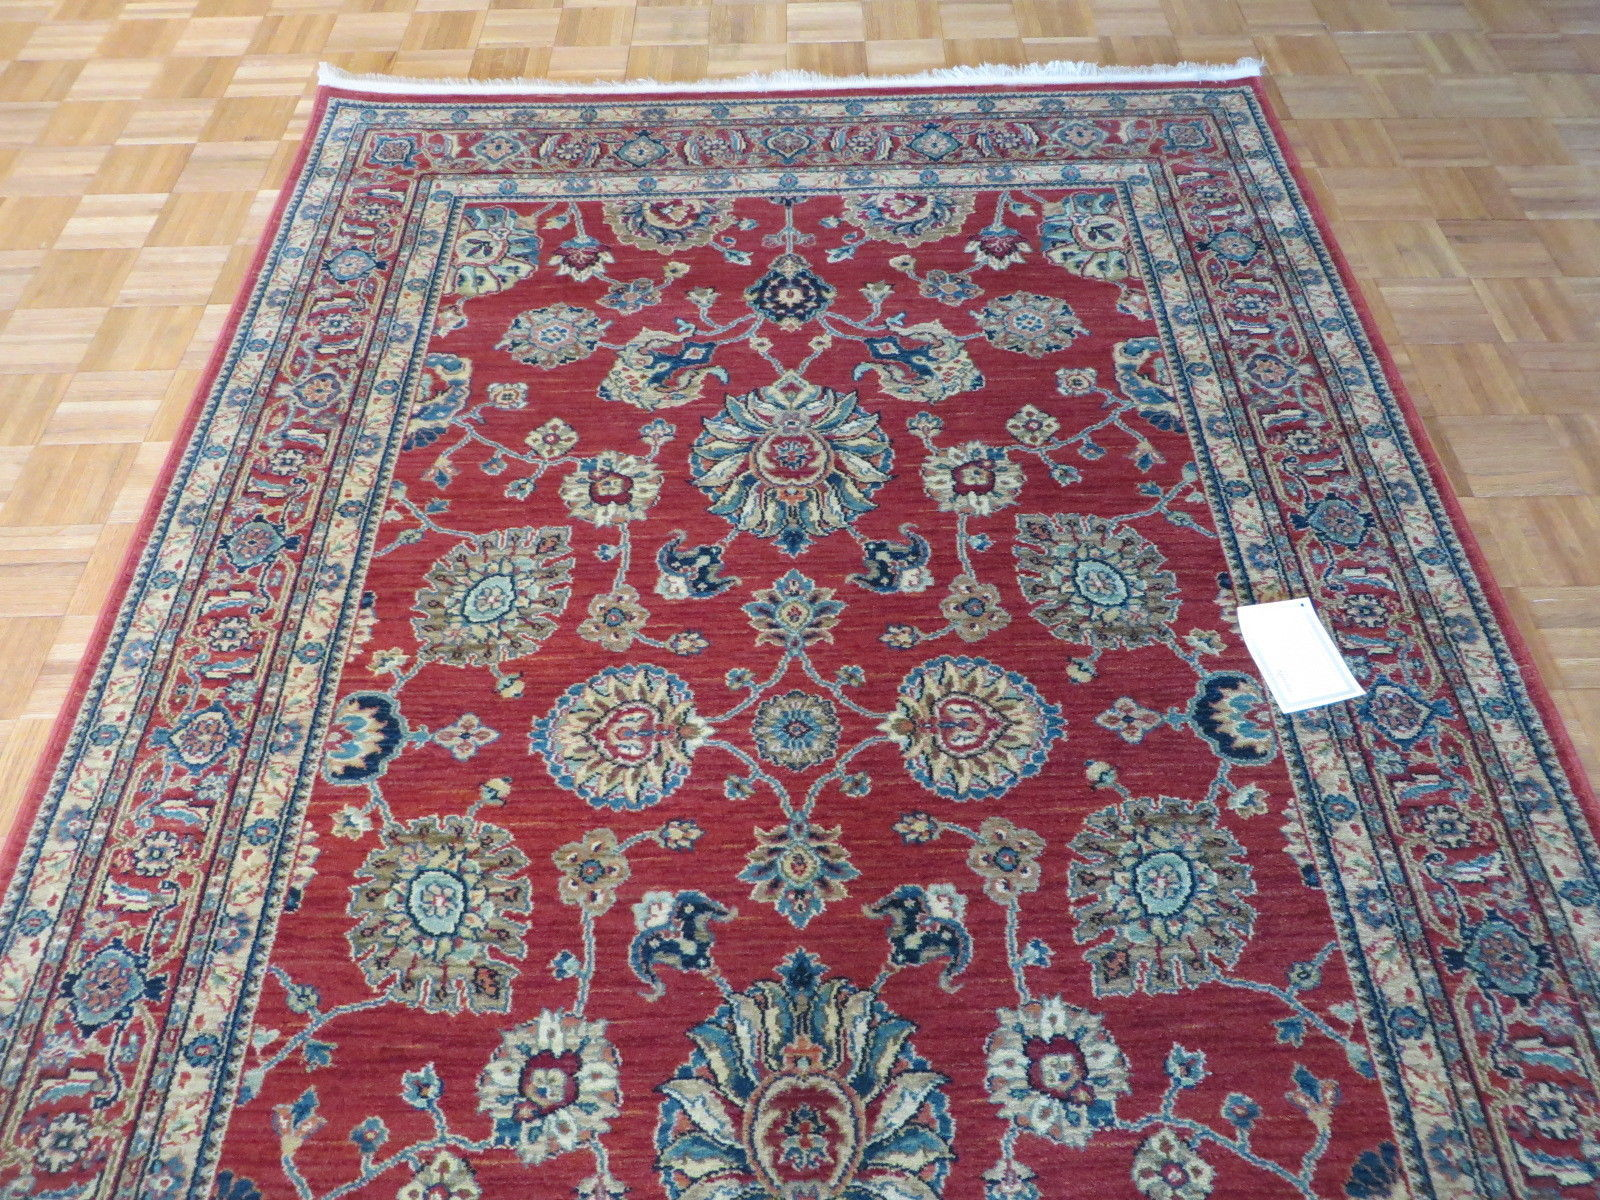 4 X 6 Brand New Karastan Rug Sovereign Sultana Red 14606